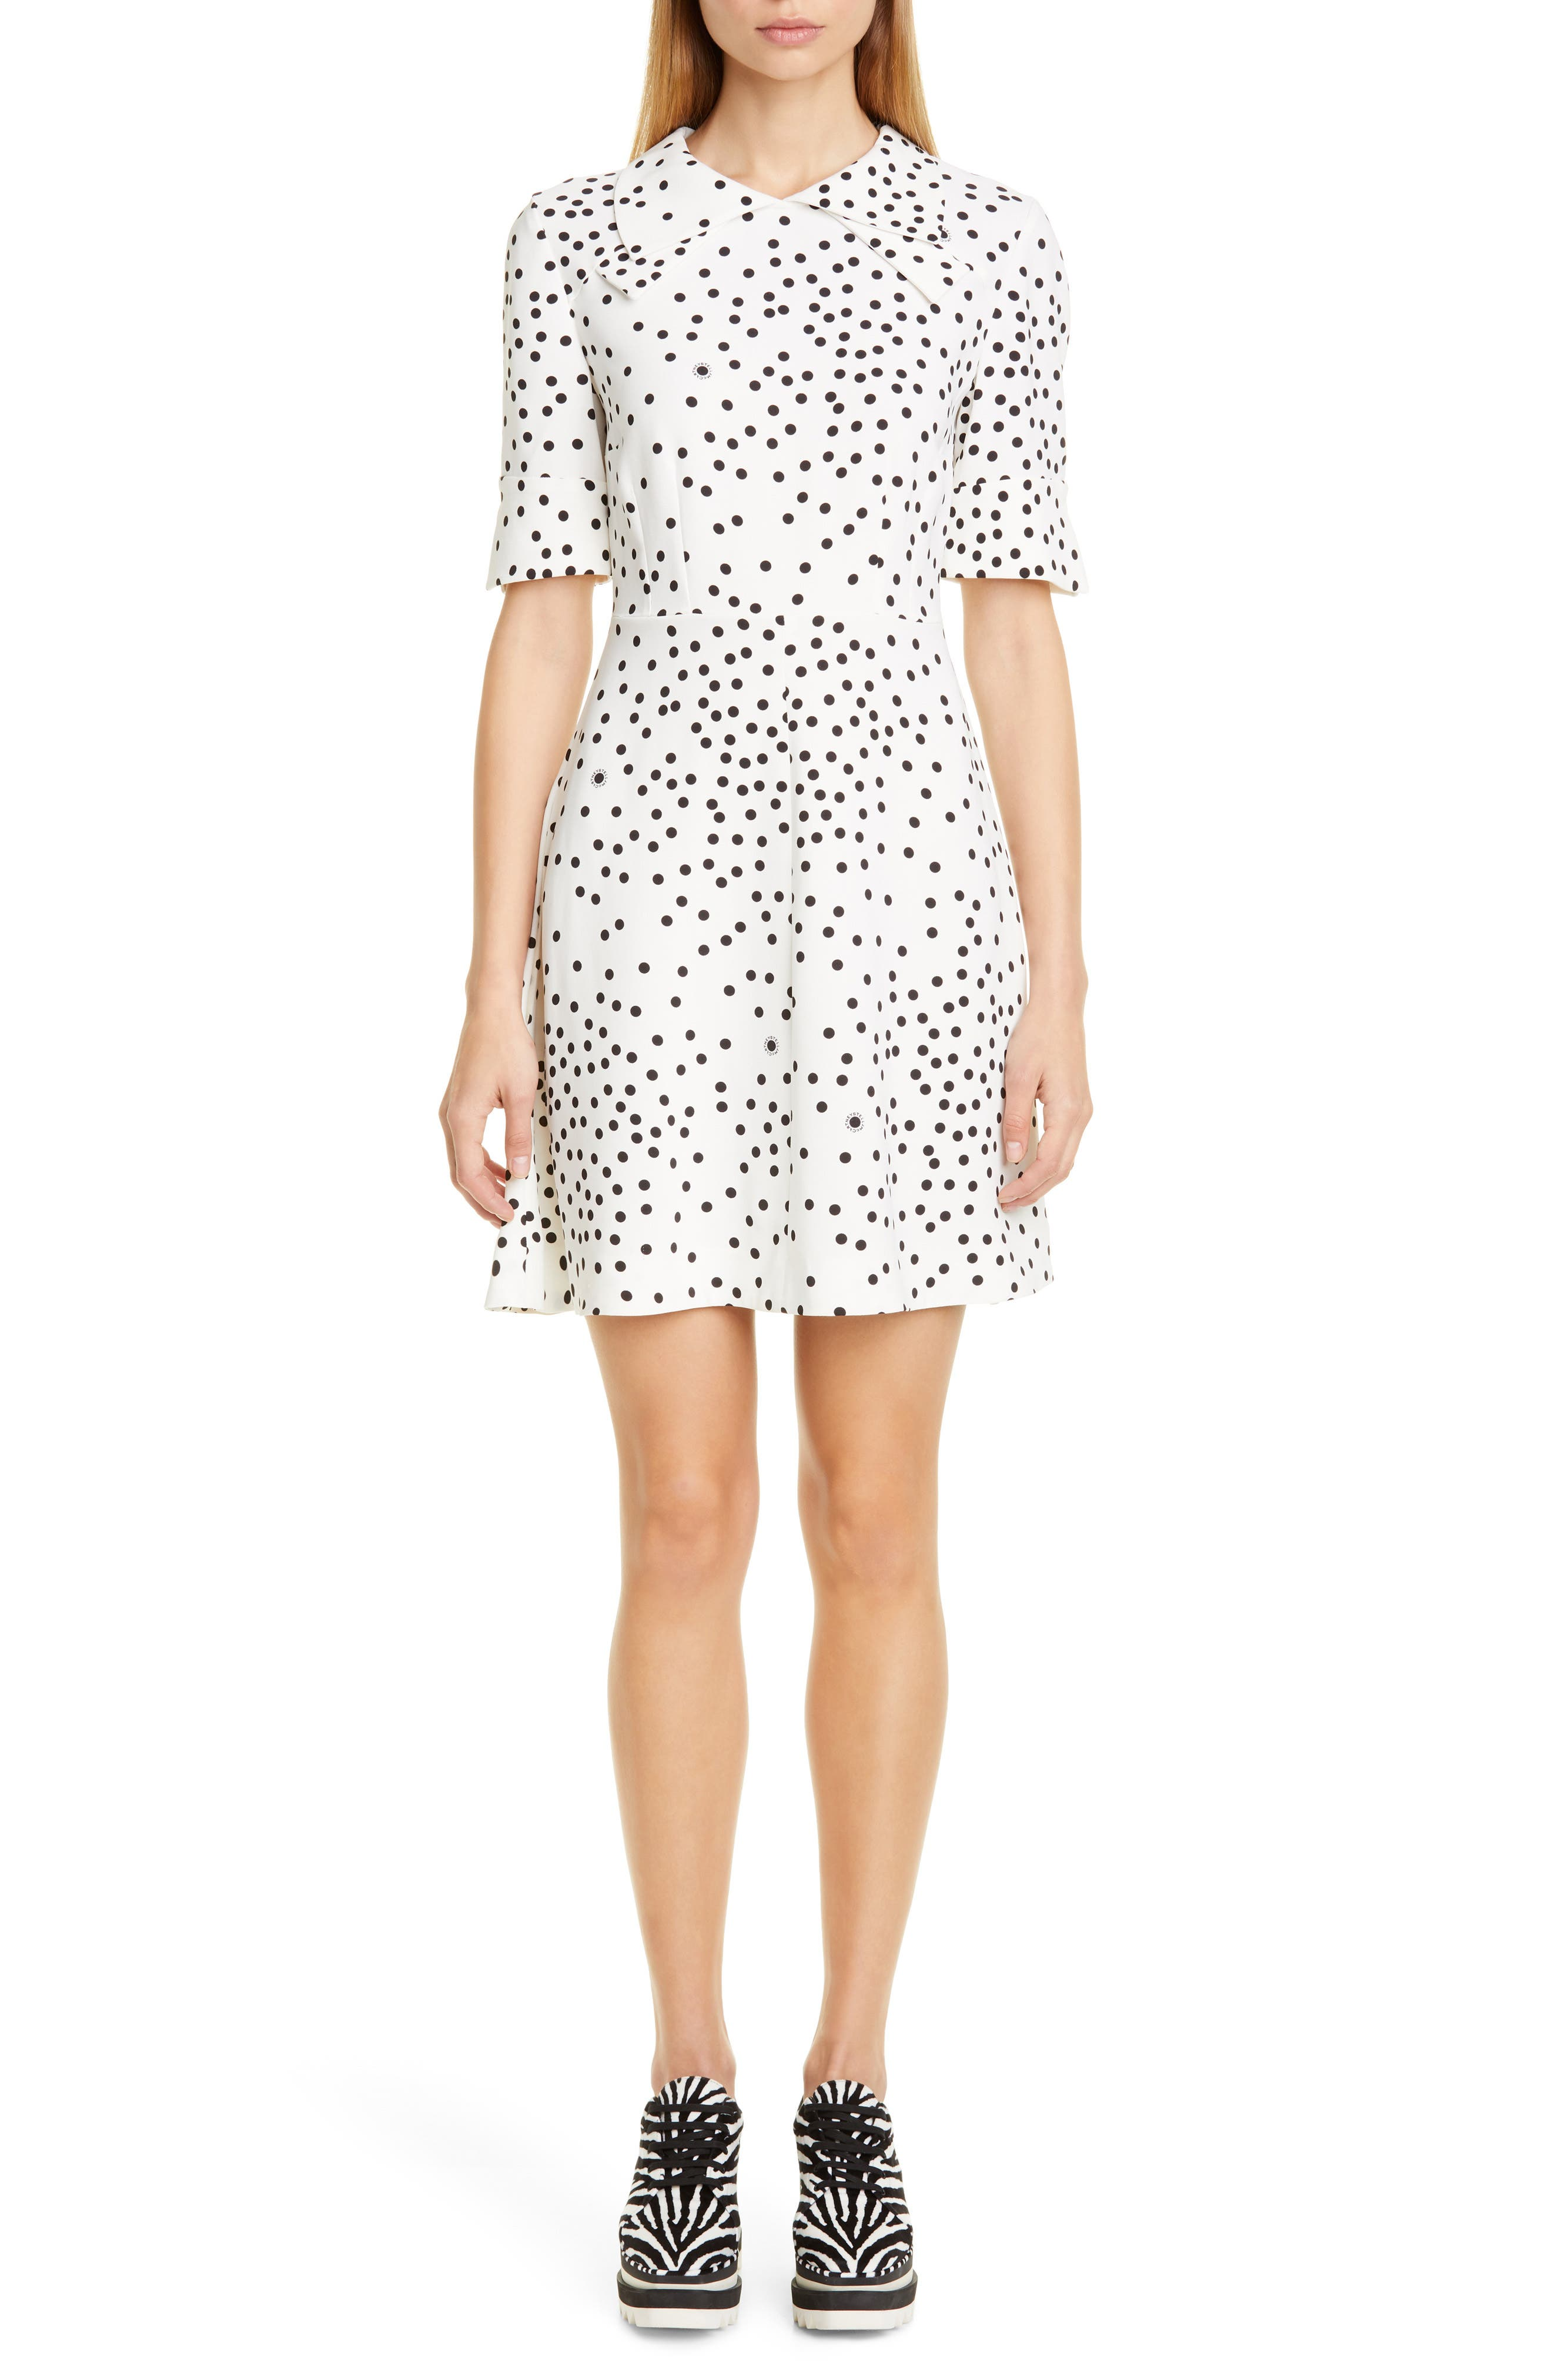 Stella Mccartney Dresses Dot Print Fit & Flare Stretch Cady Dress